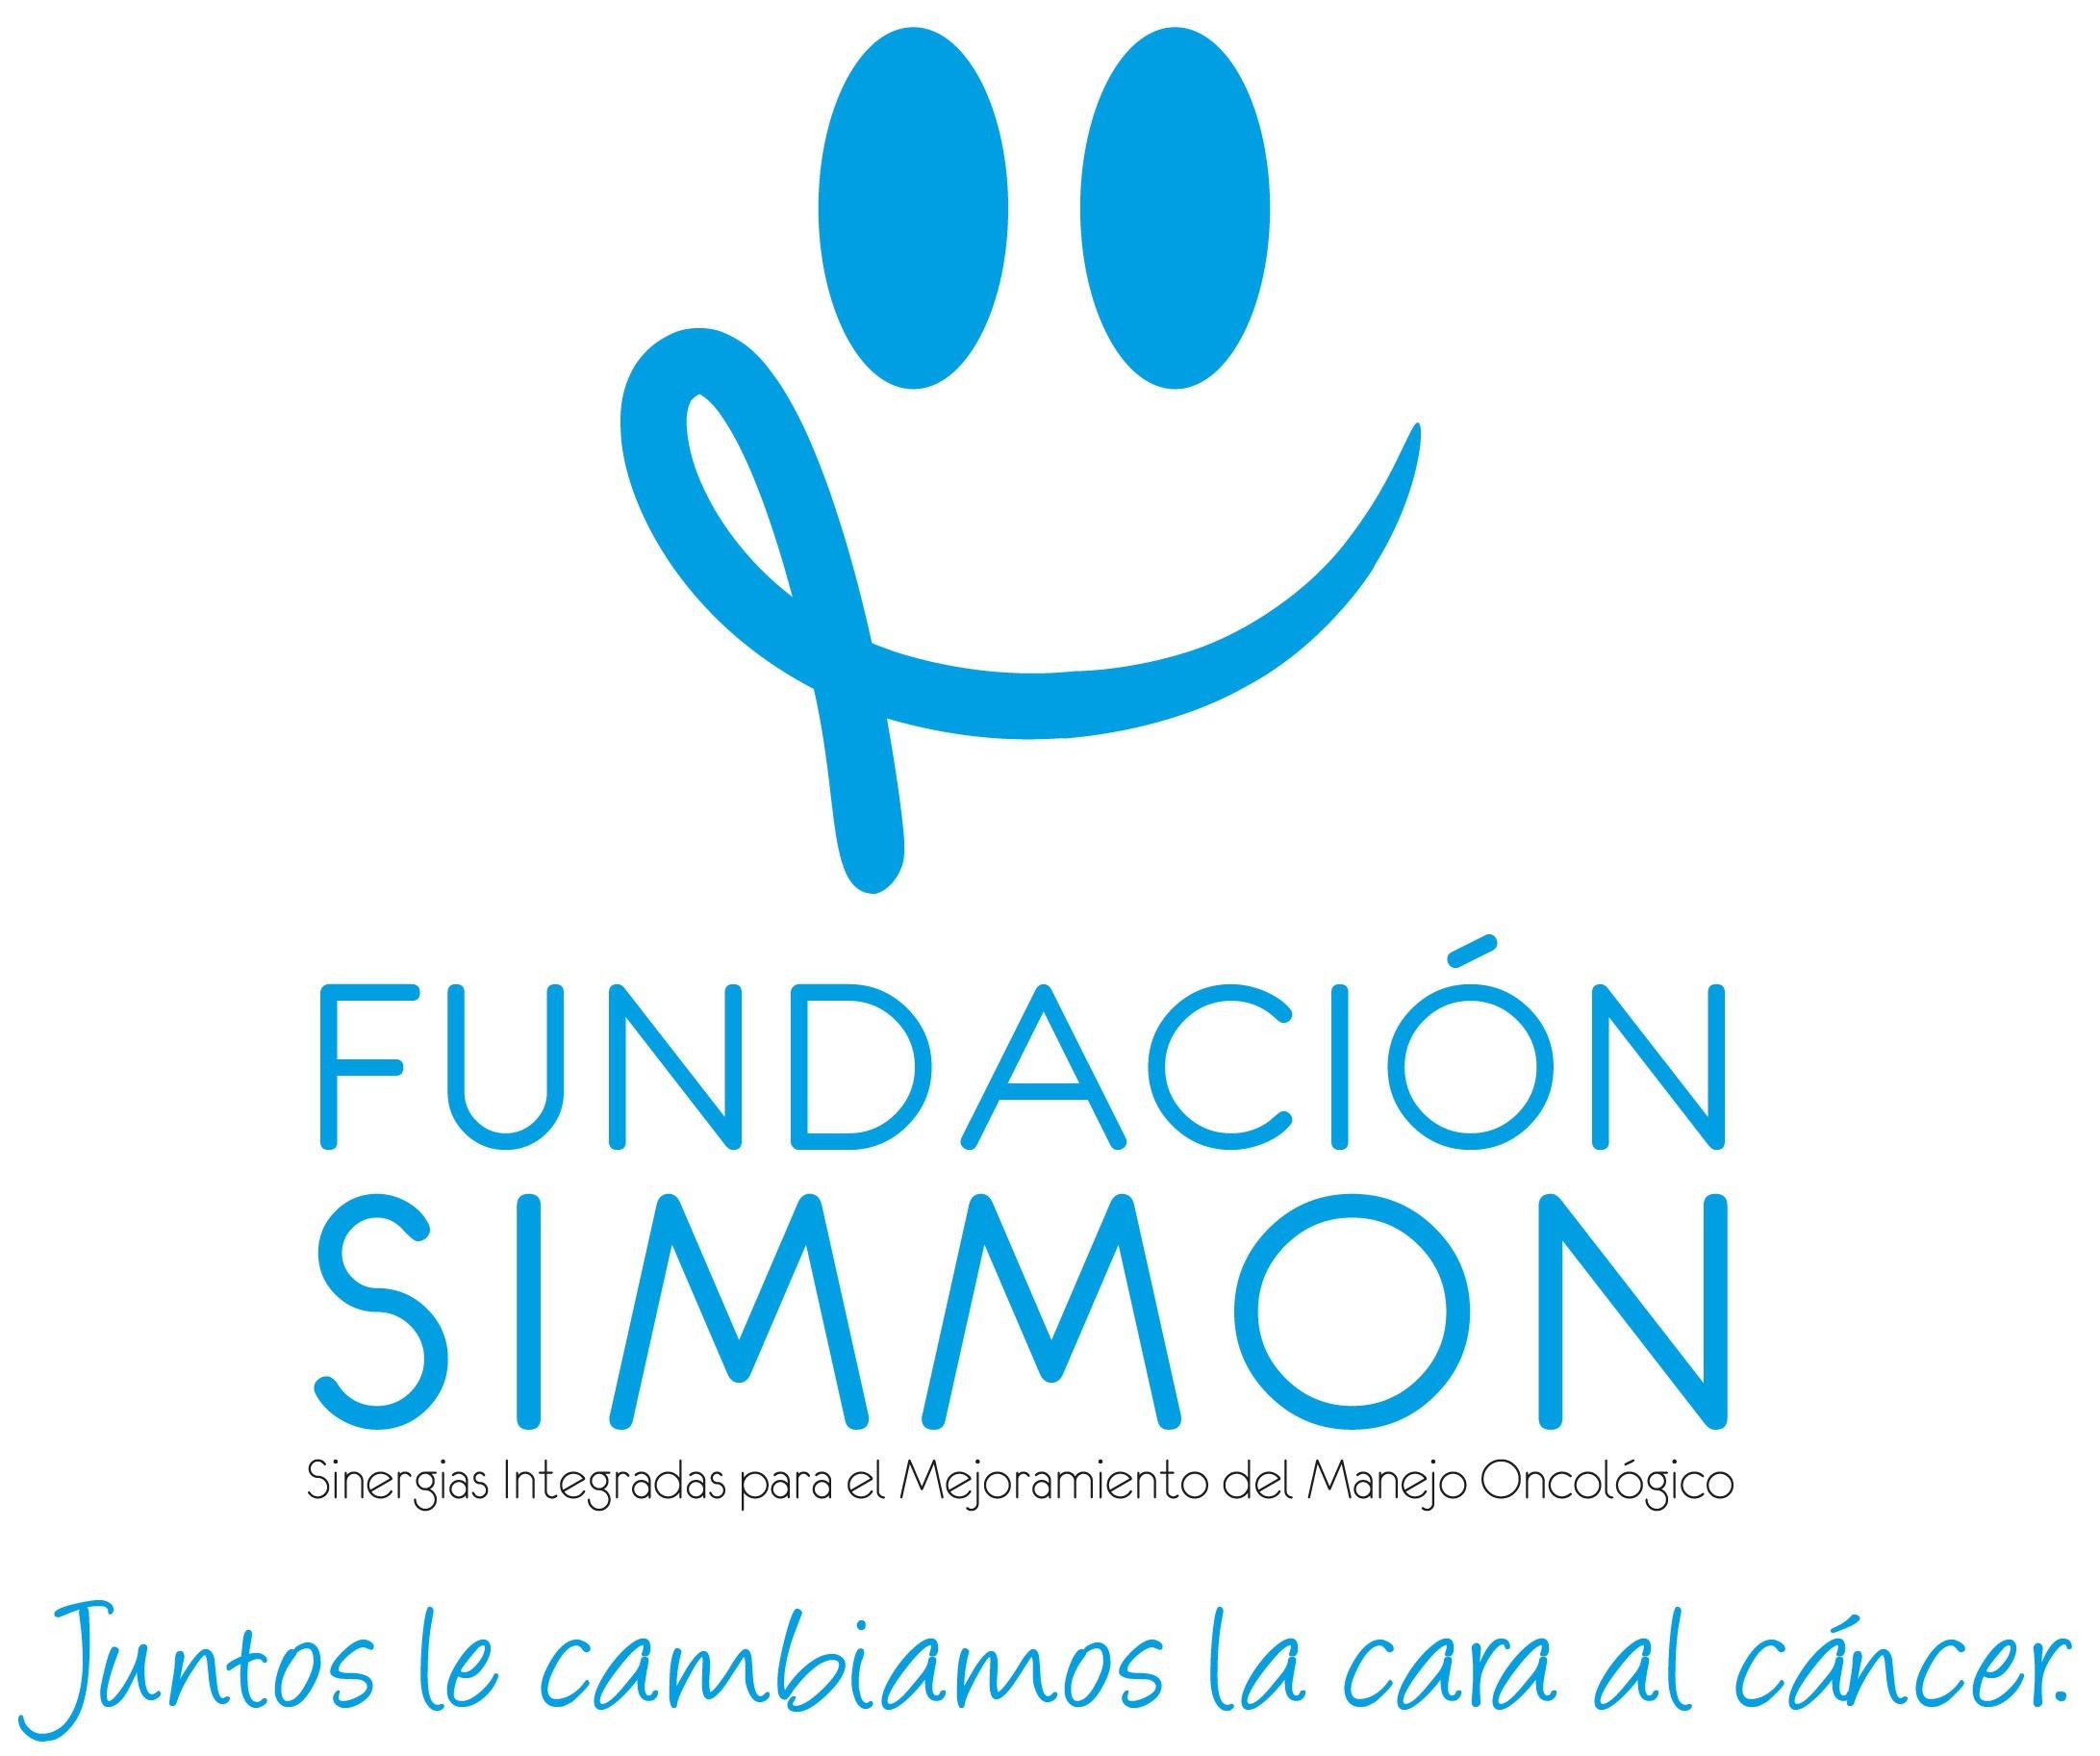 Fundacio Simmon